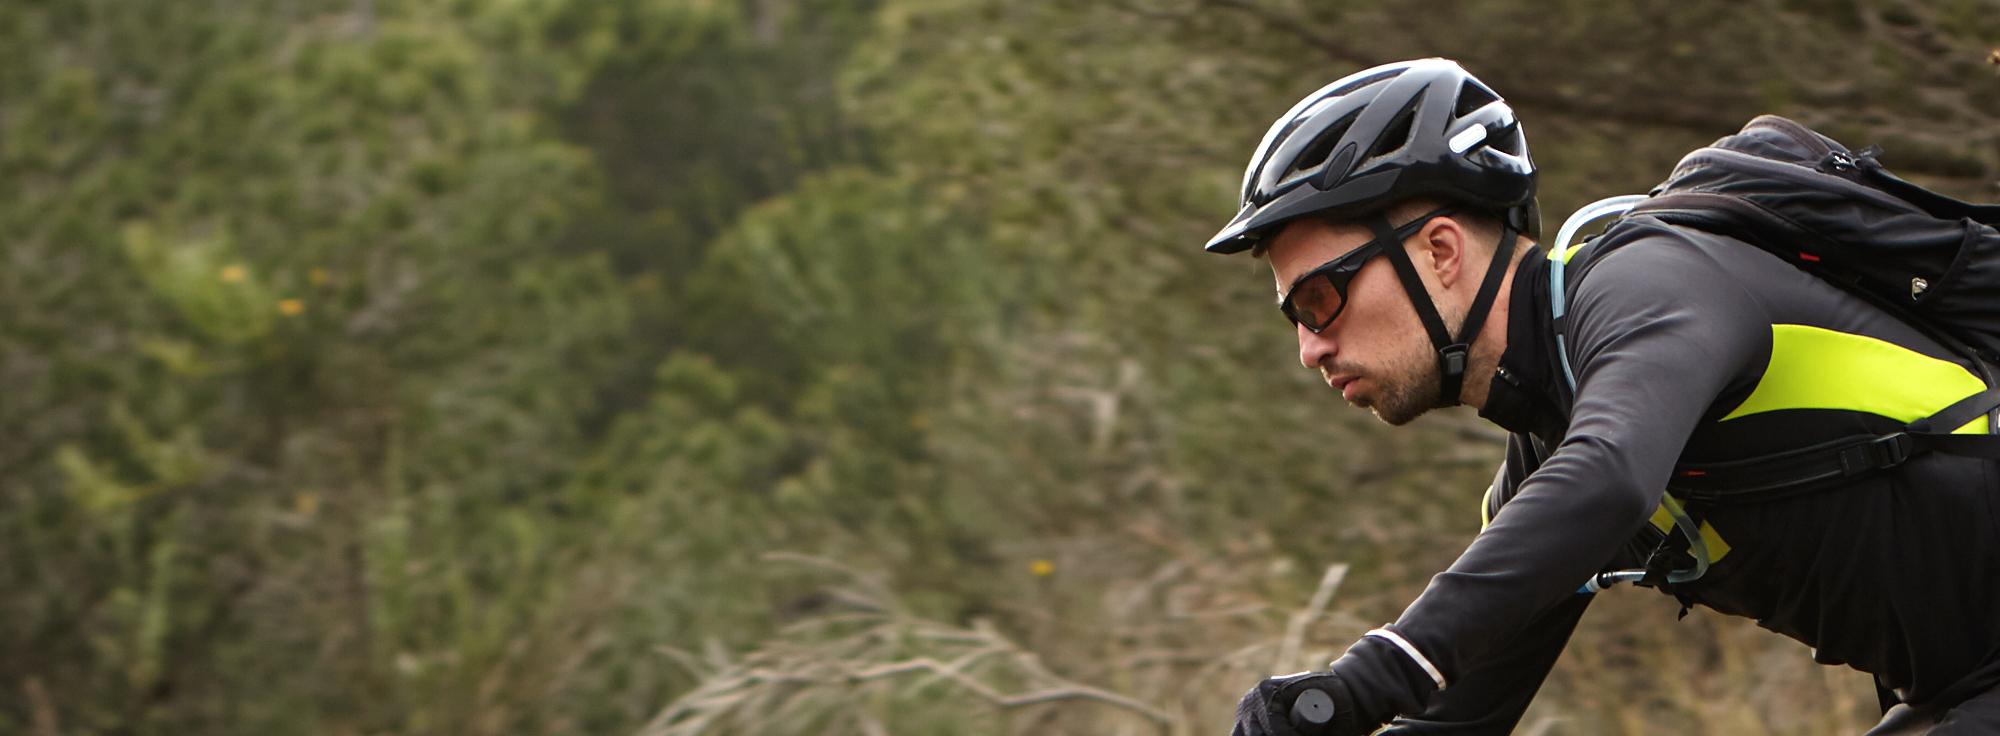 Man mountain biking wearing sunglasses